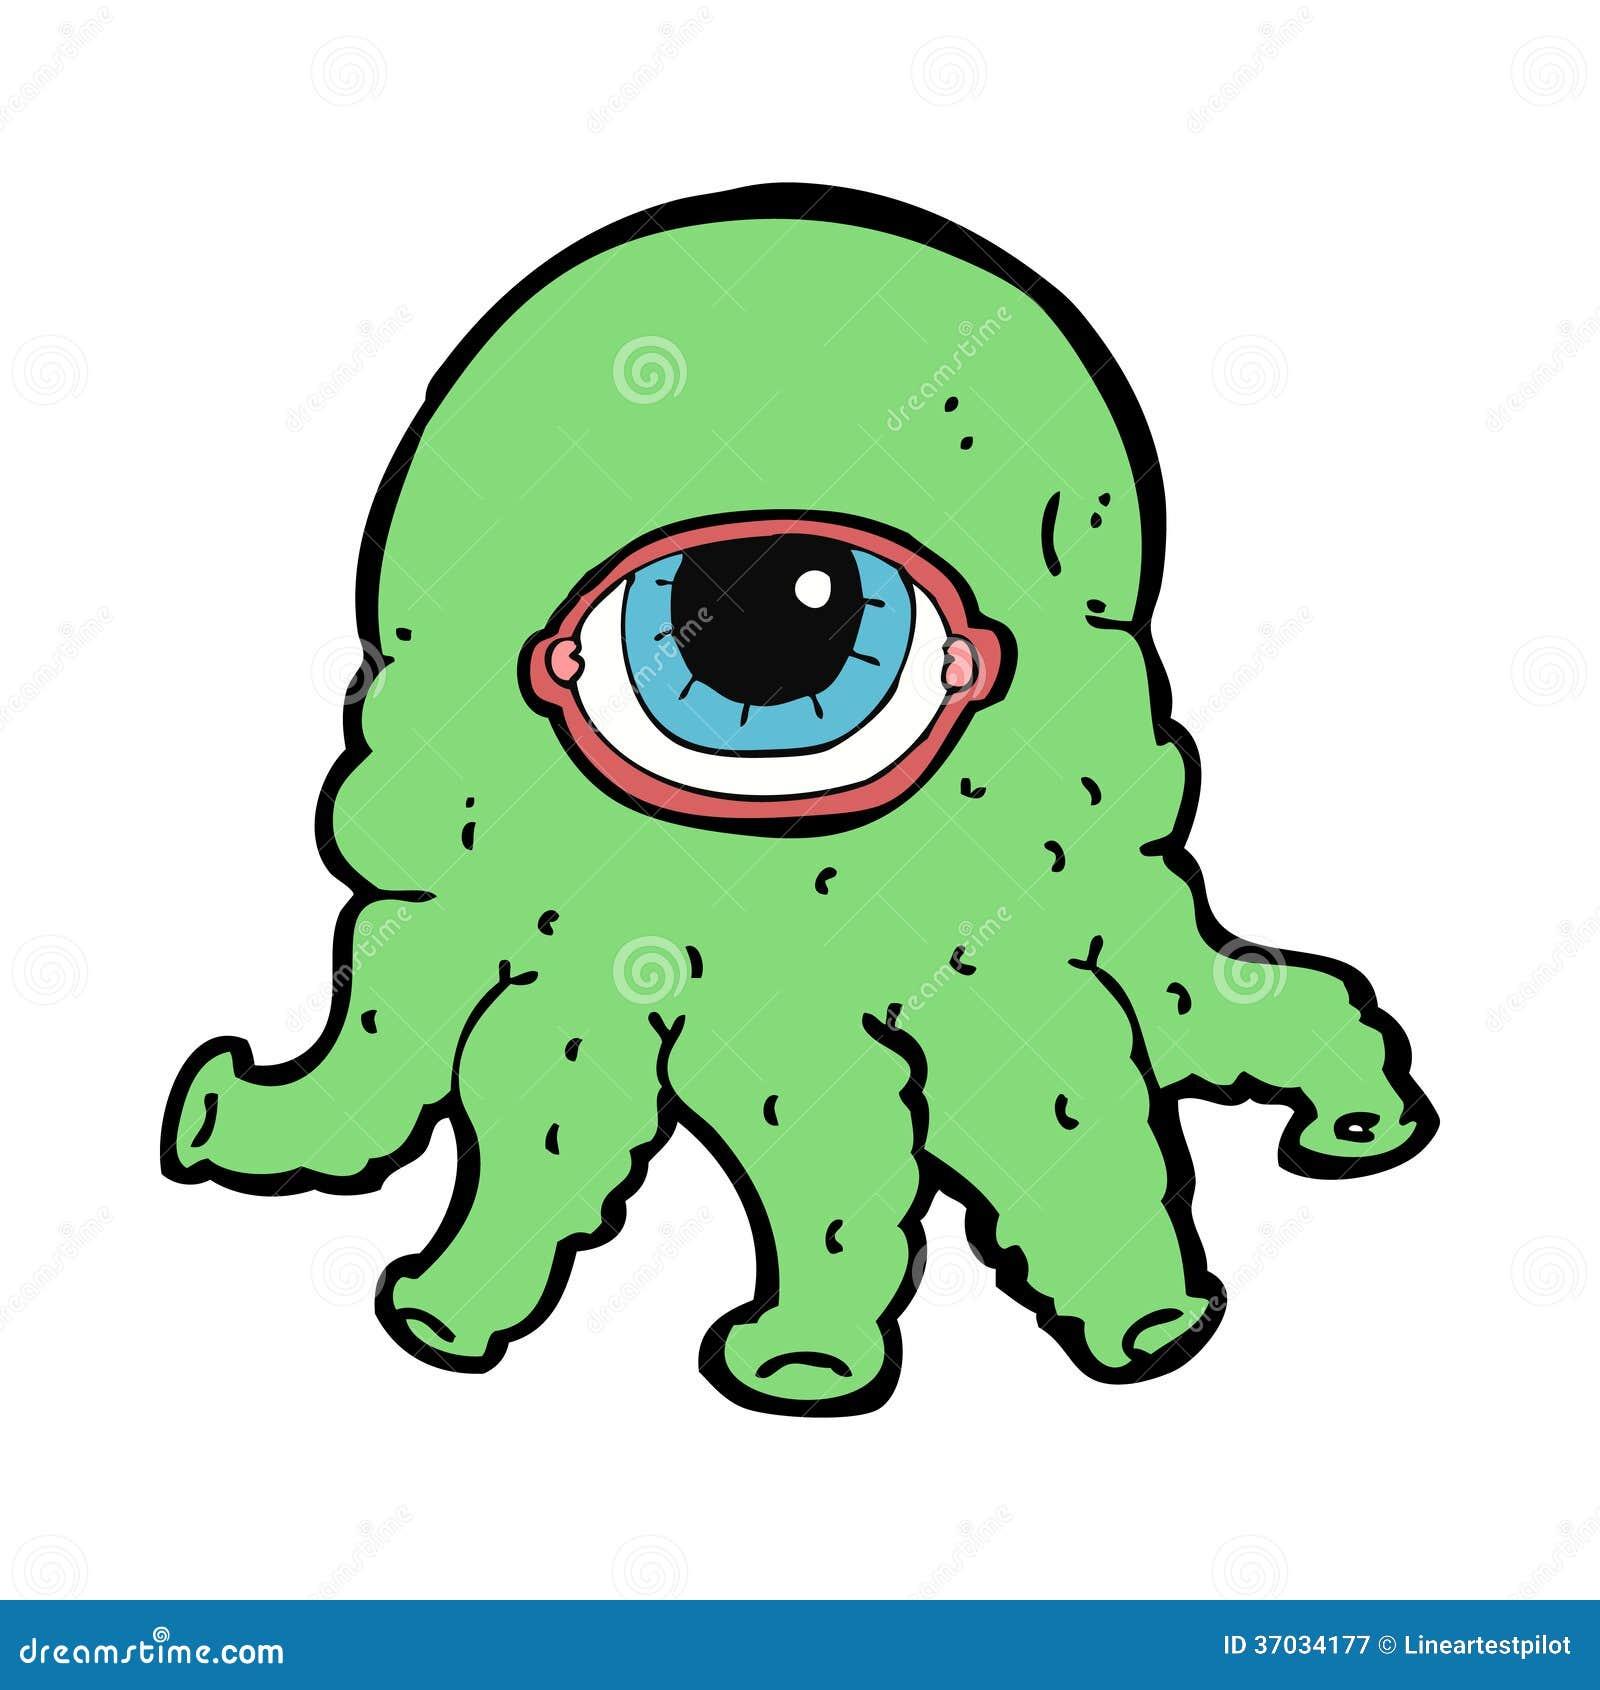 cartoon alien head royalty free stock photography image 37034177